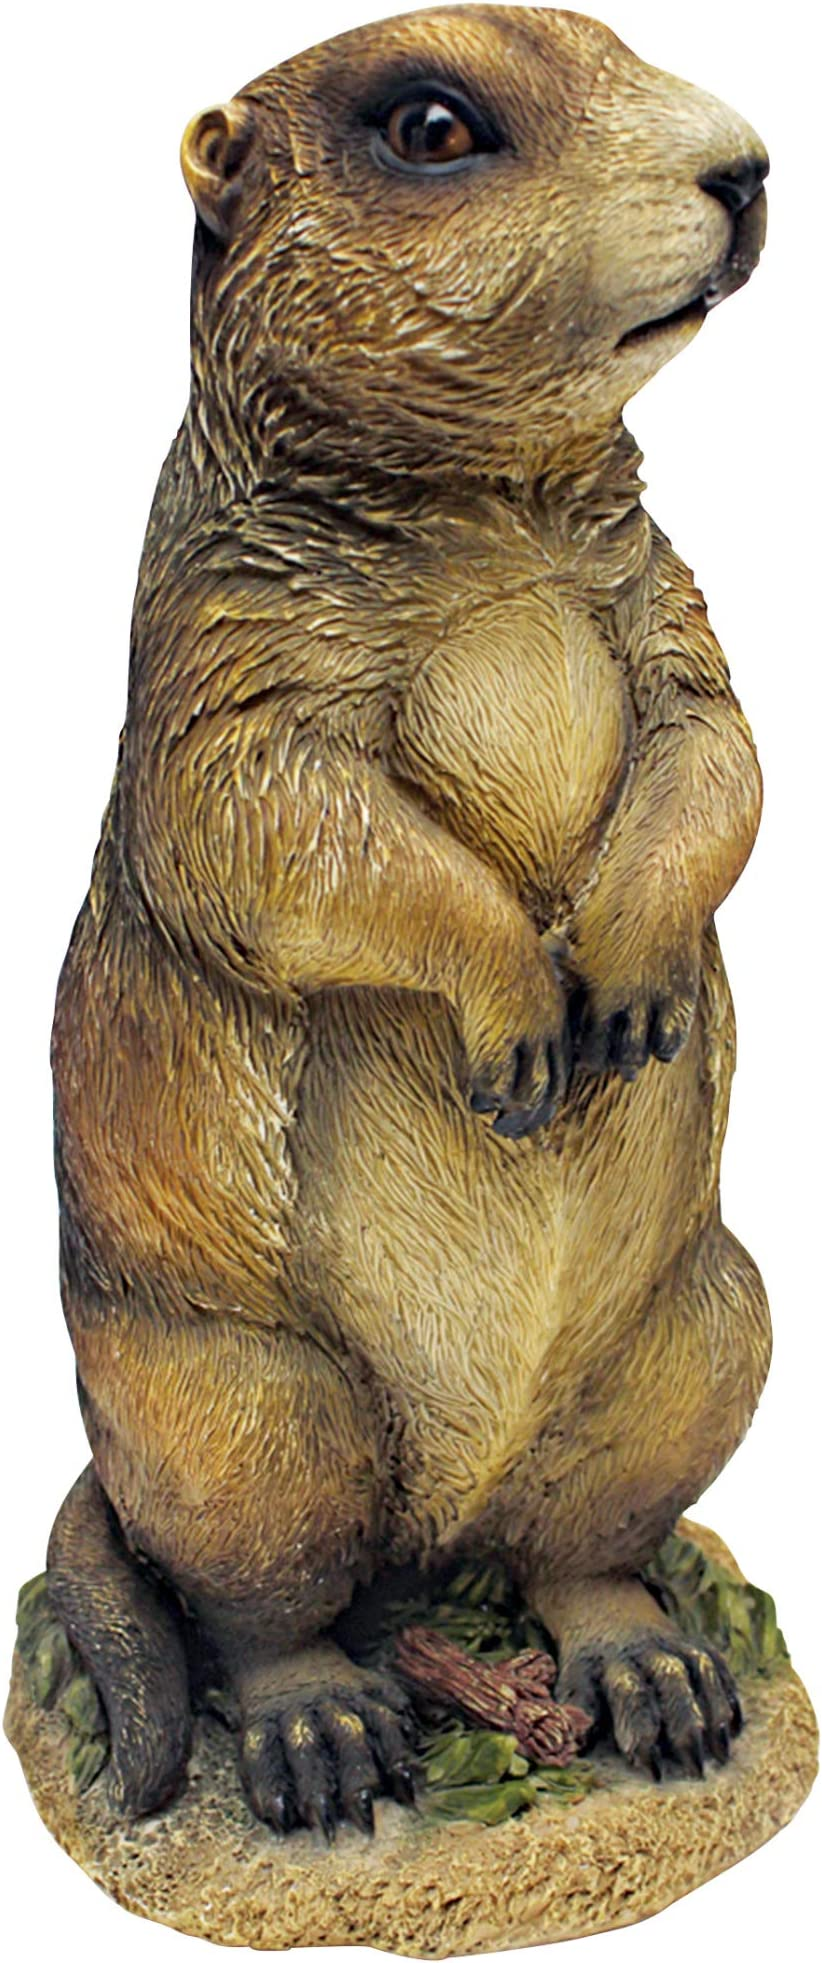 marmot statue groundhog statue gopher statue gopher garden statue groundhog gopher figurine groundhog concrete ornament statue animal statue